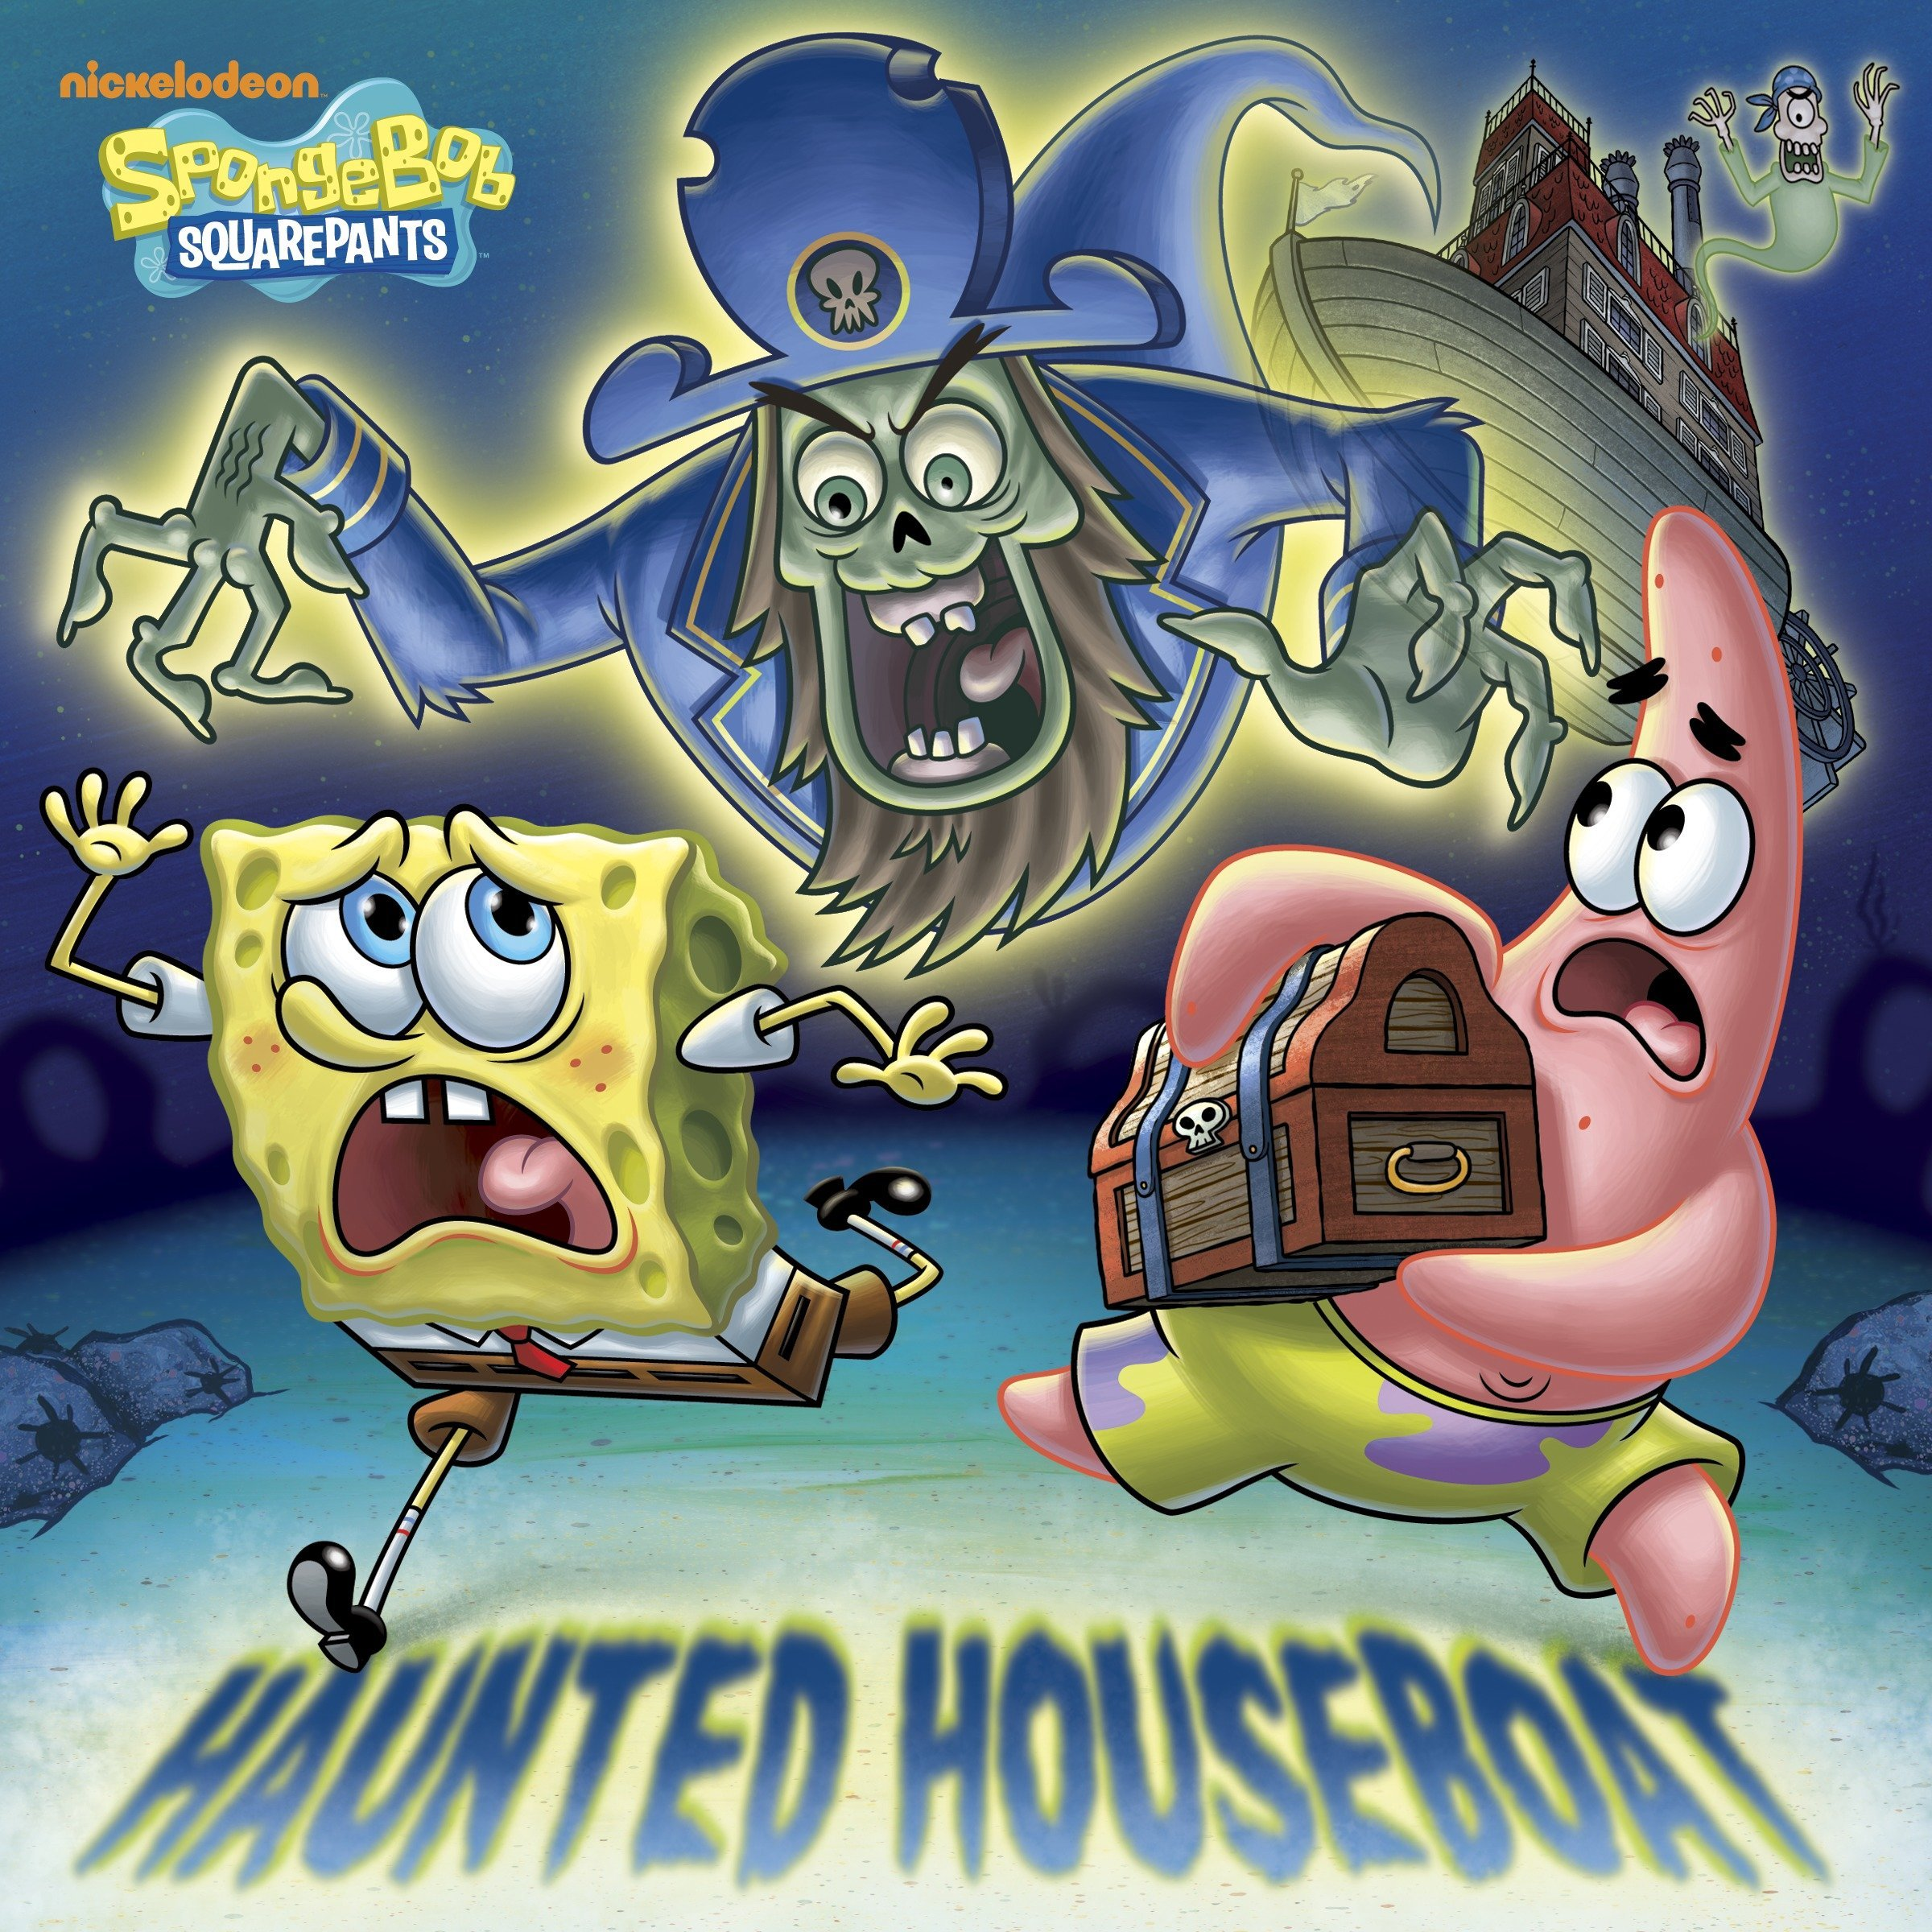 File:Haunted Houseboat book.jpg